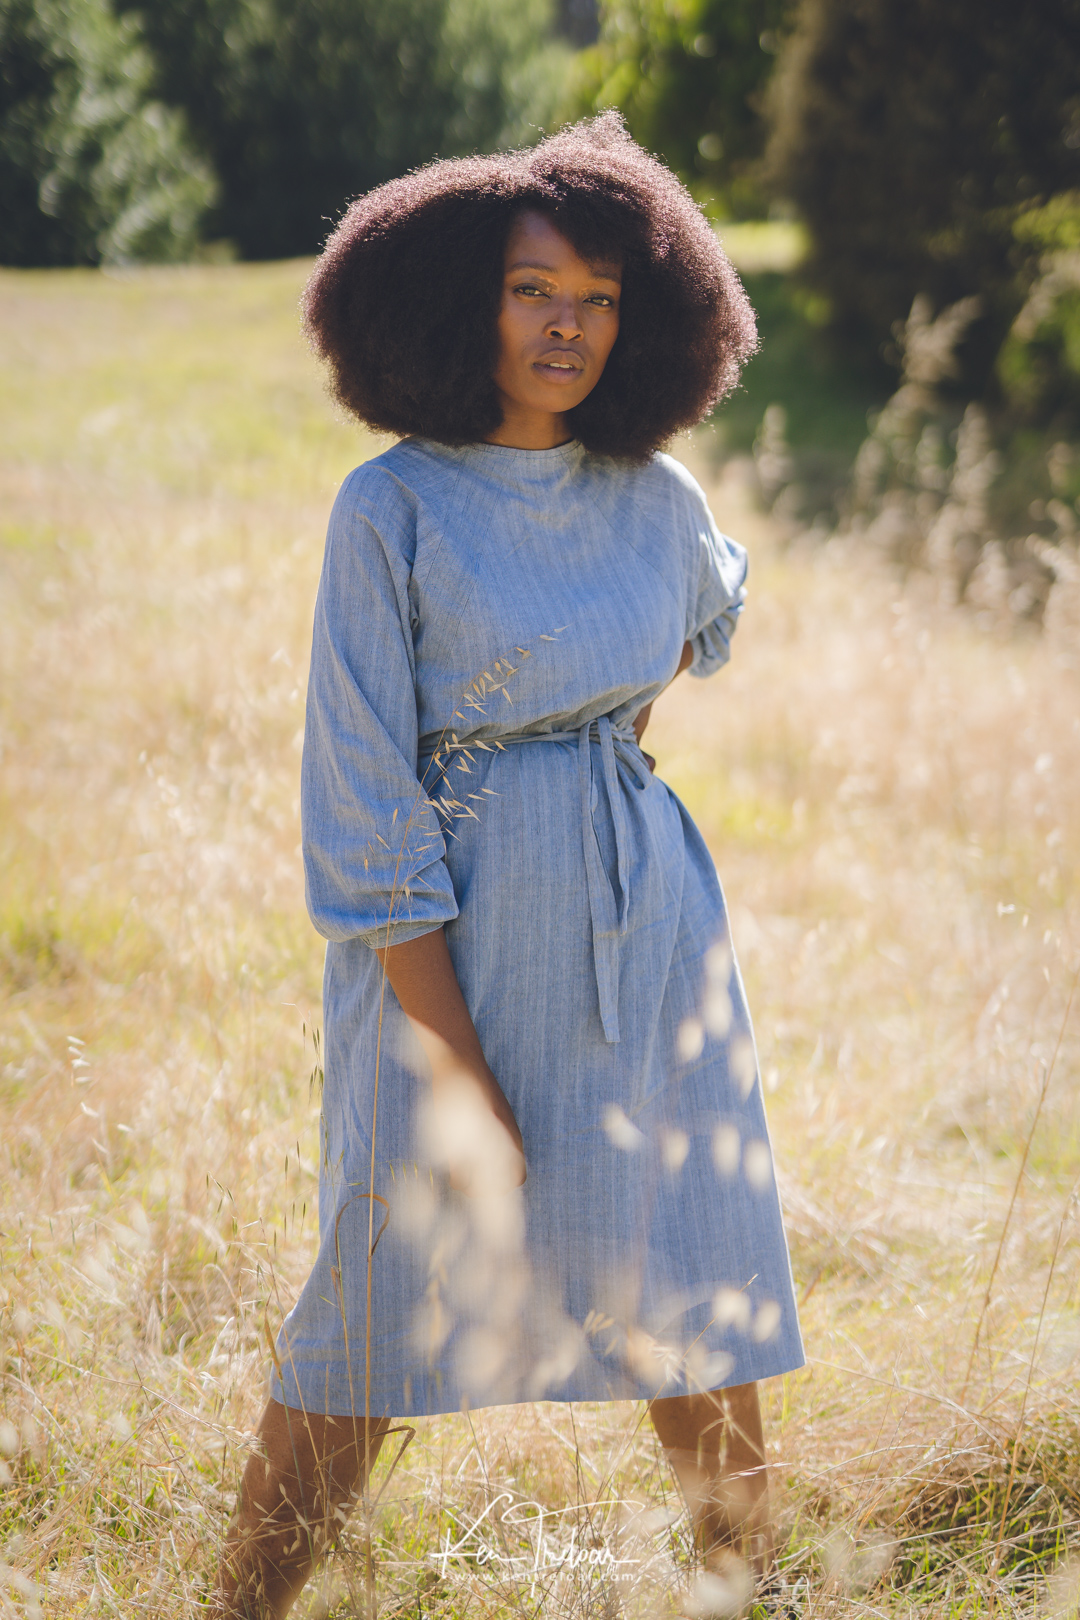 Ken Treloar Photography - Natural L-ight Editorial Portrait Fashion Photo Session - Cape Town Dec 2018.jpg